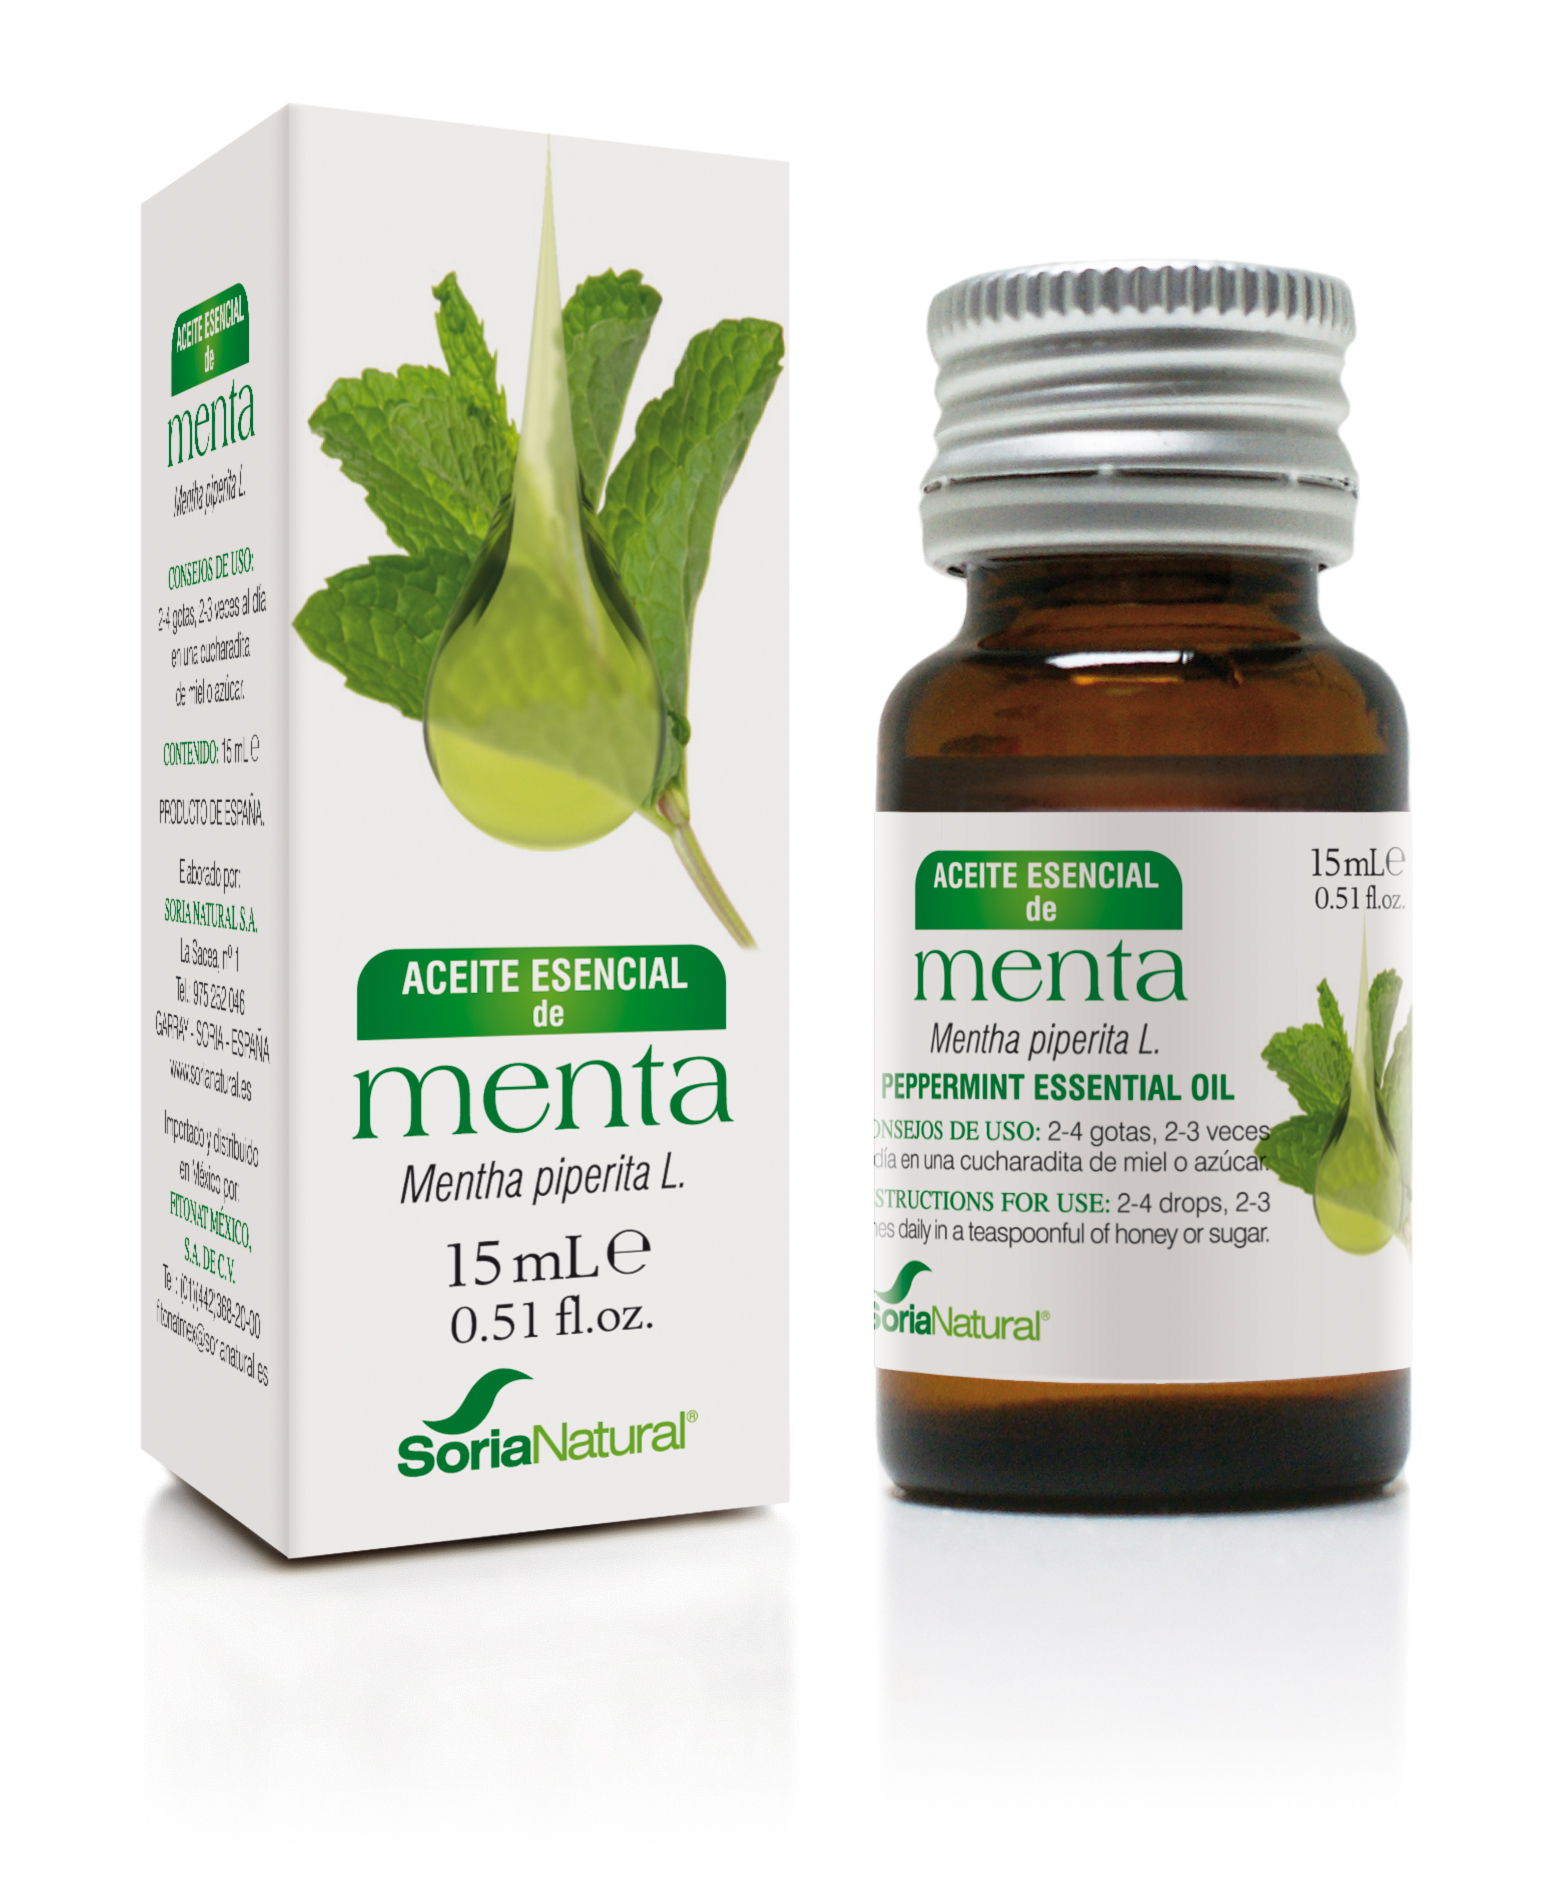 Mentha piperita